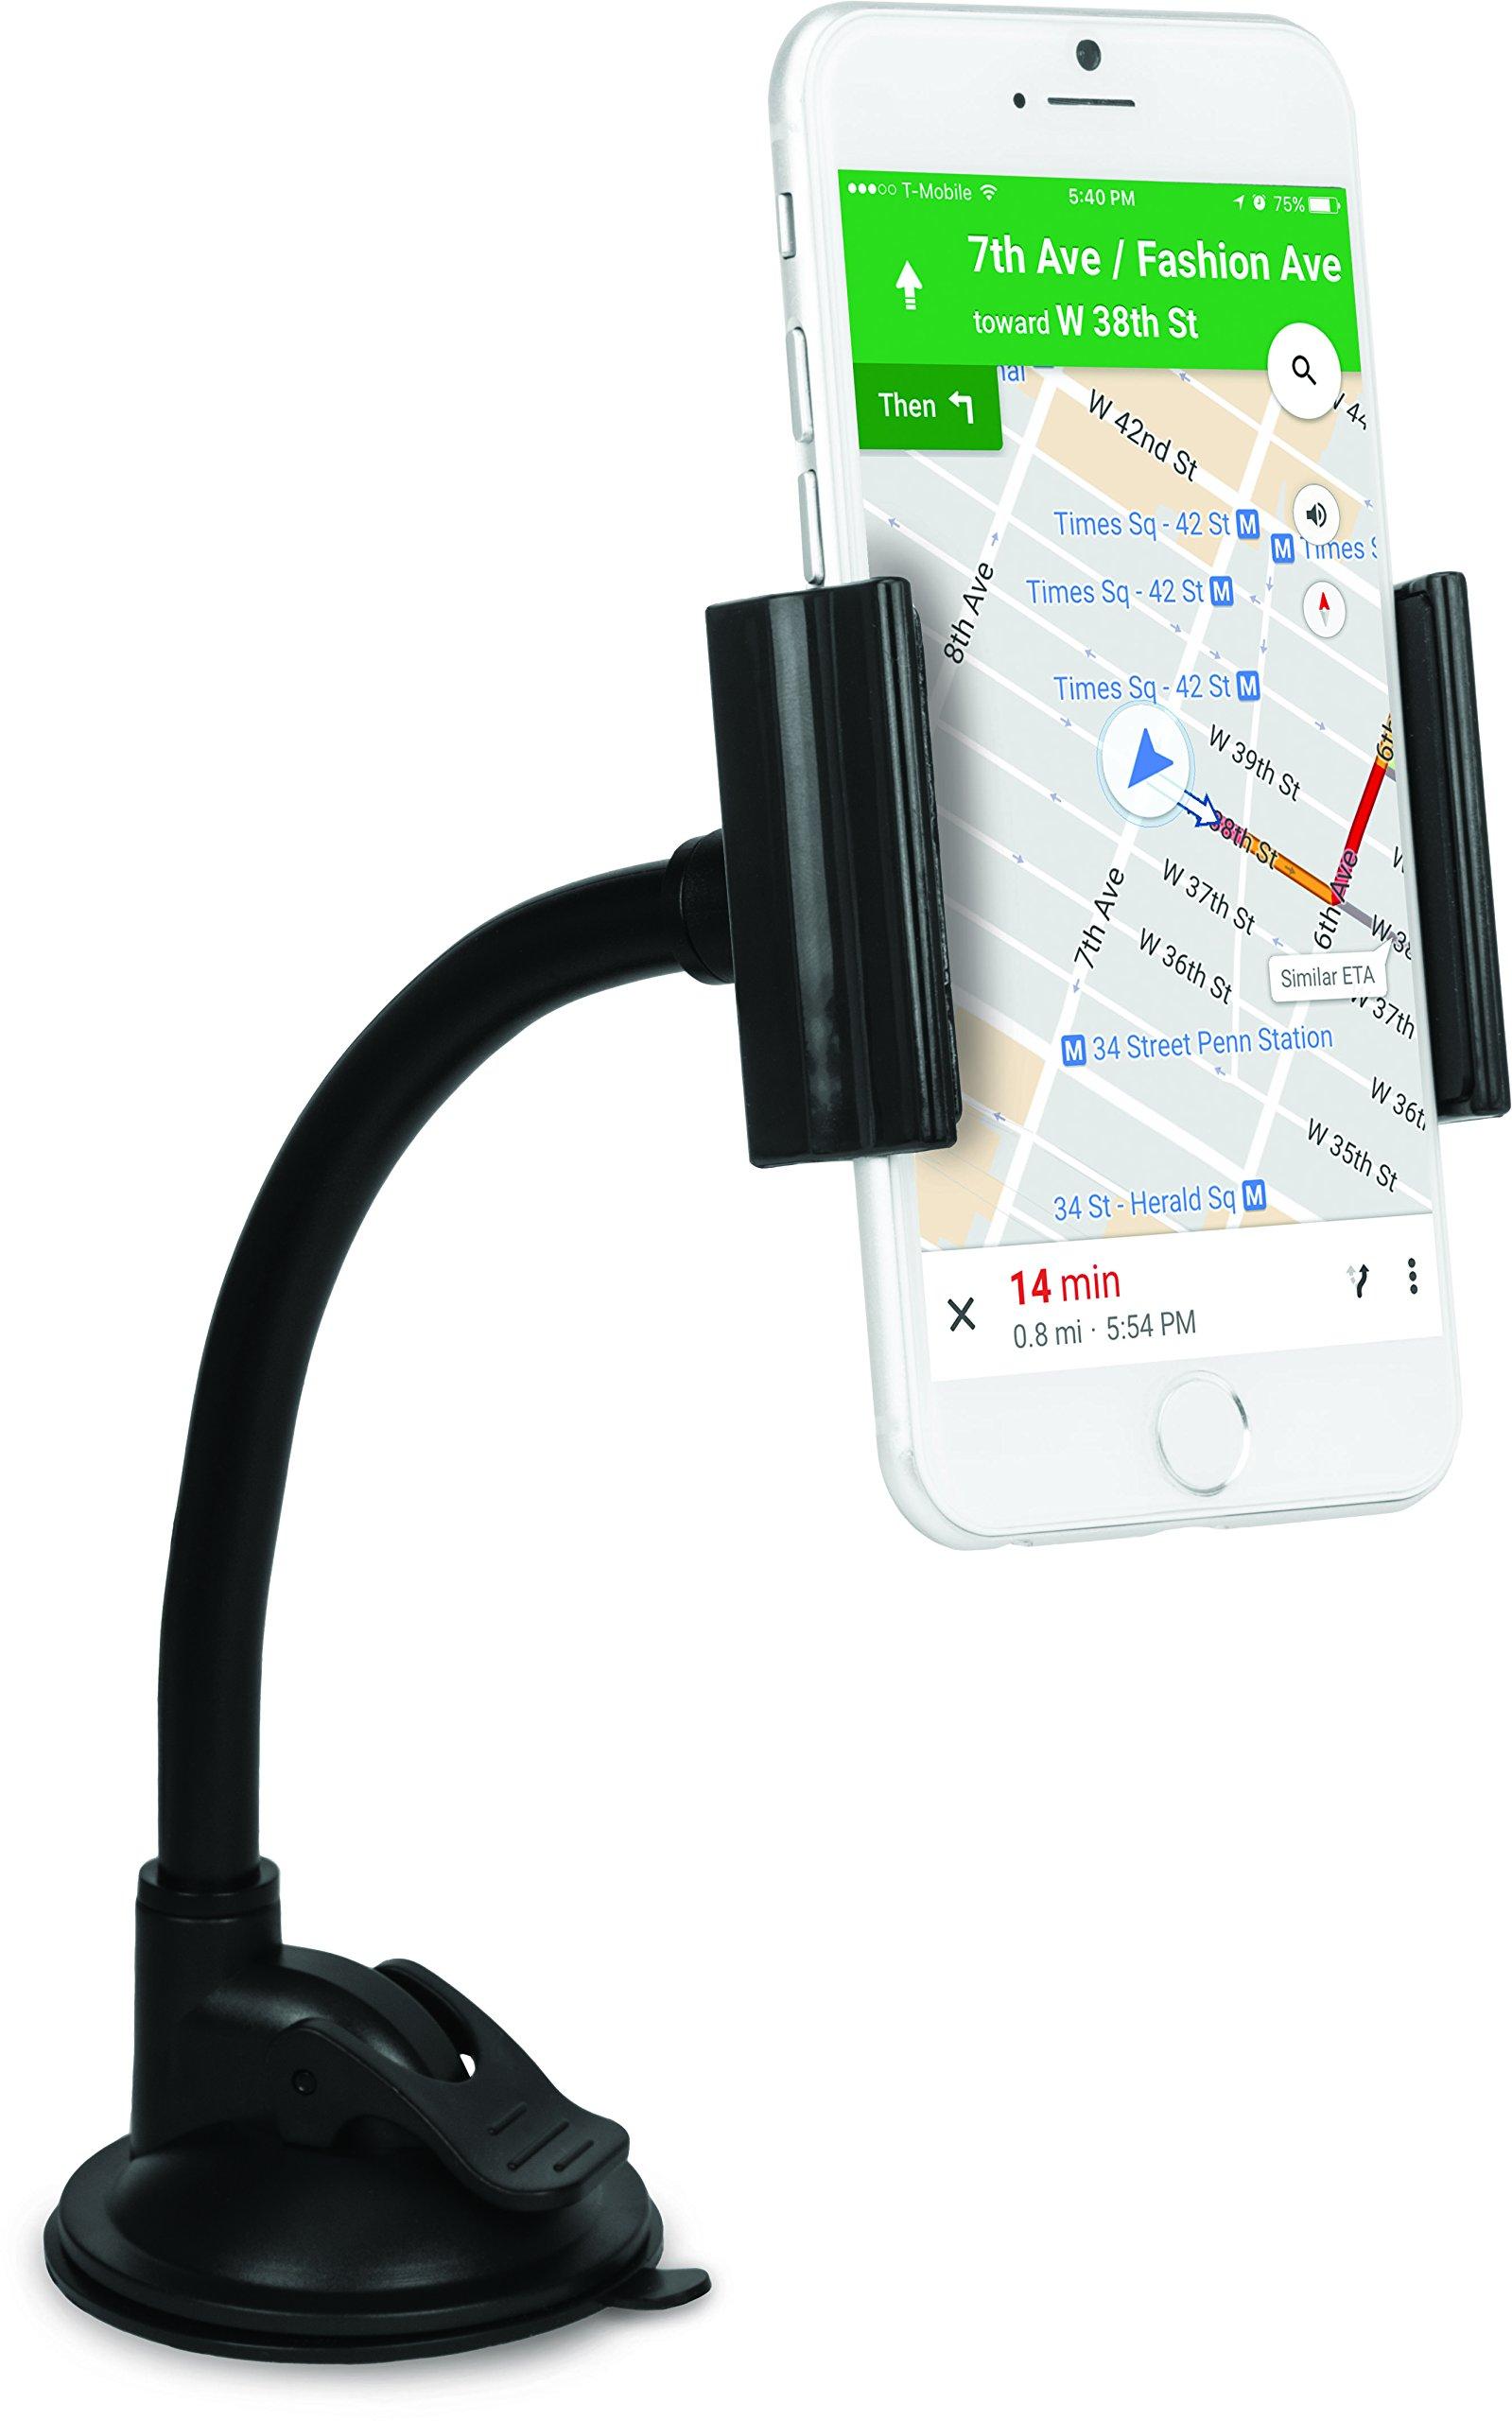 iHome IH-CM316B Car Mount for Universal Smartphones - Black